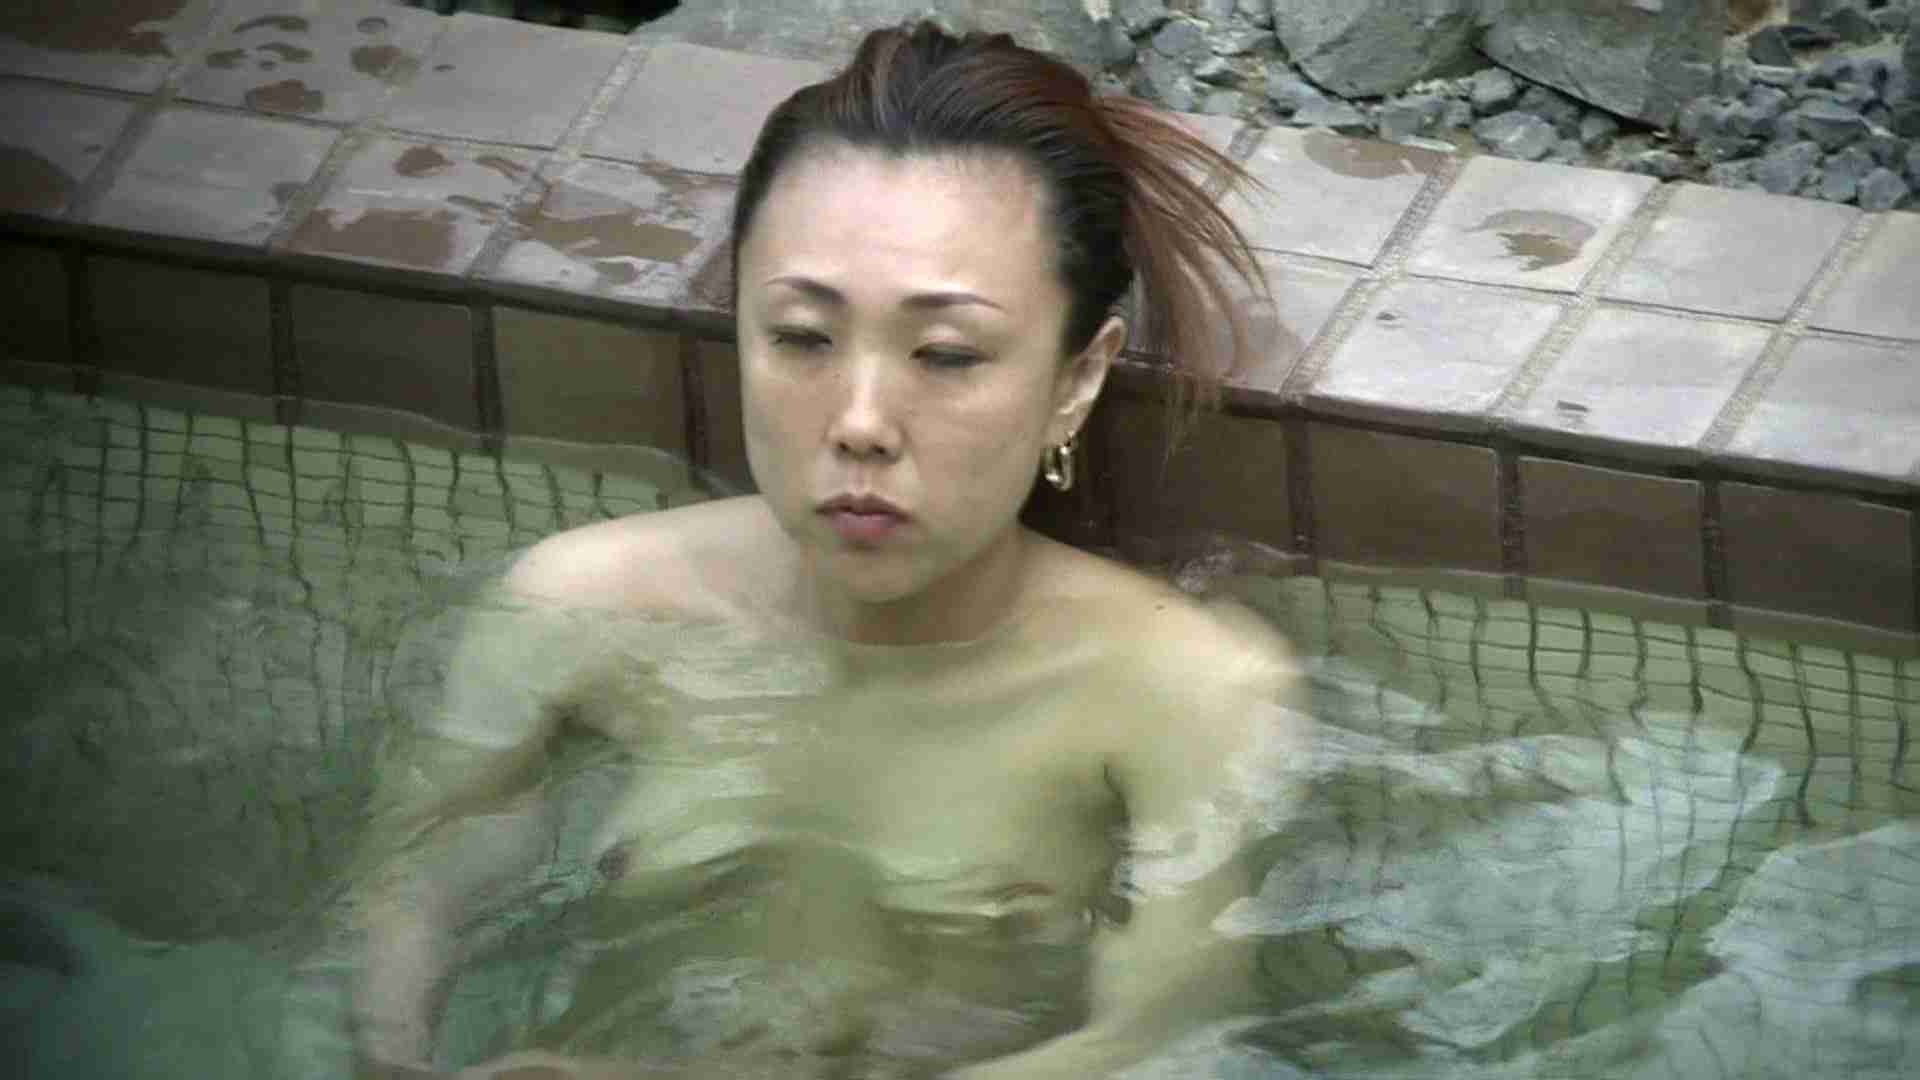 Aquaな露天風呂Vol.654 女体盗撮   OL女体  87連発 37